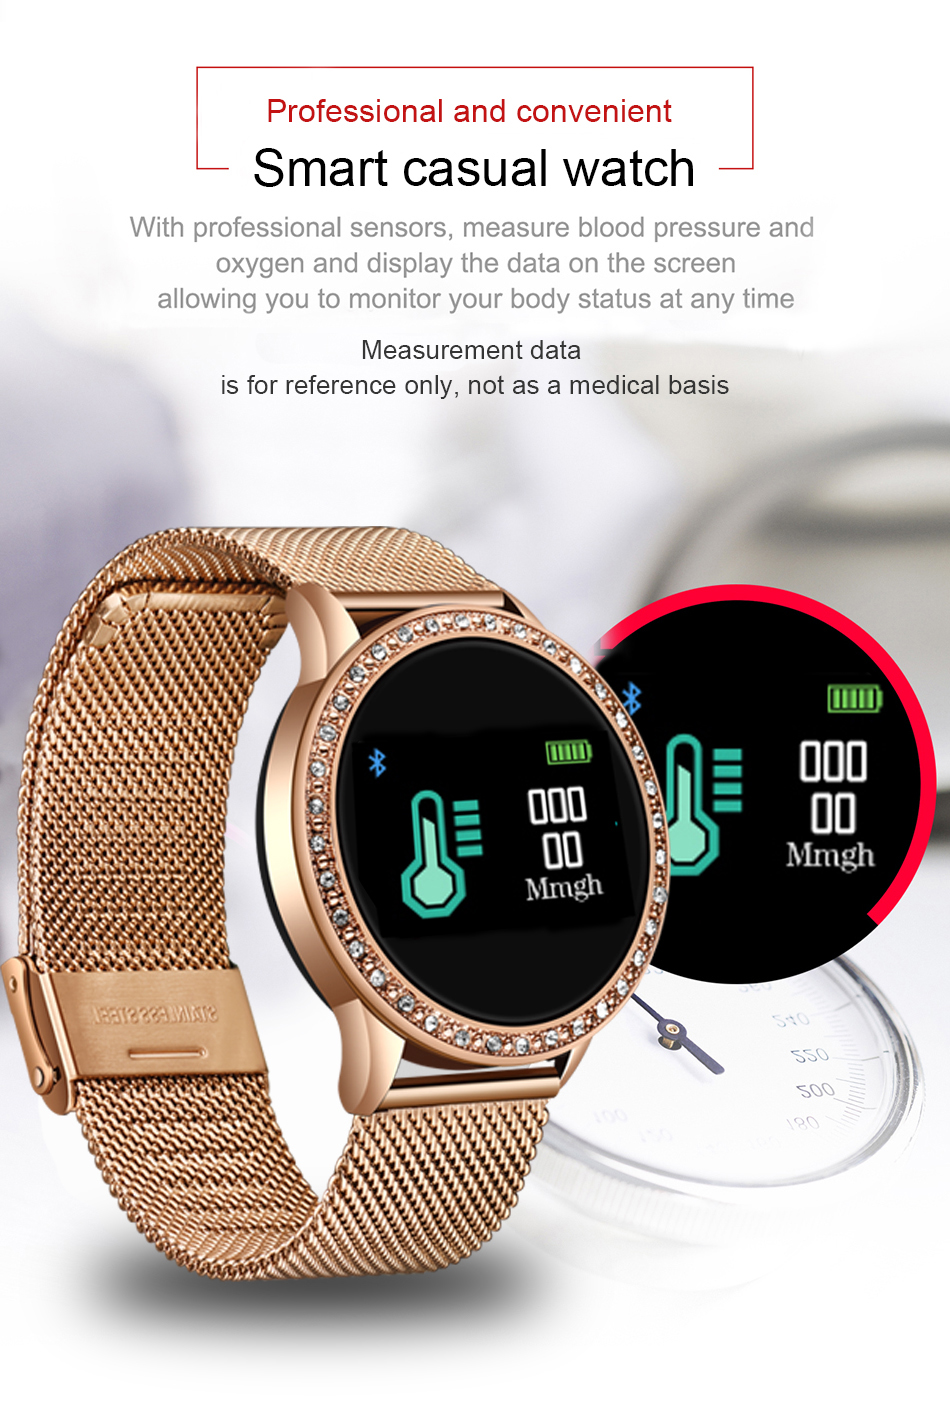 H41c7de2aa2c6411393e78d55396f29302 LIGE 2020 New Smart Watch Women Men Heart Rate Blood Pressure Sport Multi-function Watch fitness tracker Fashion smartwatch+Box